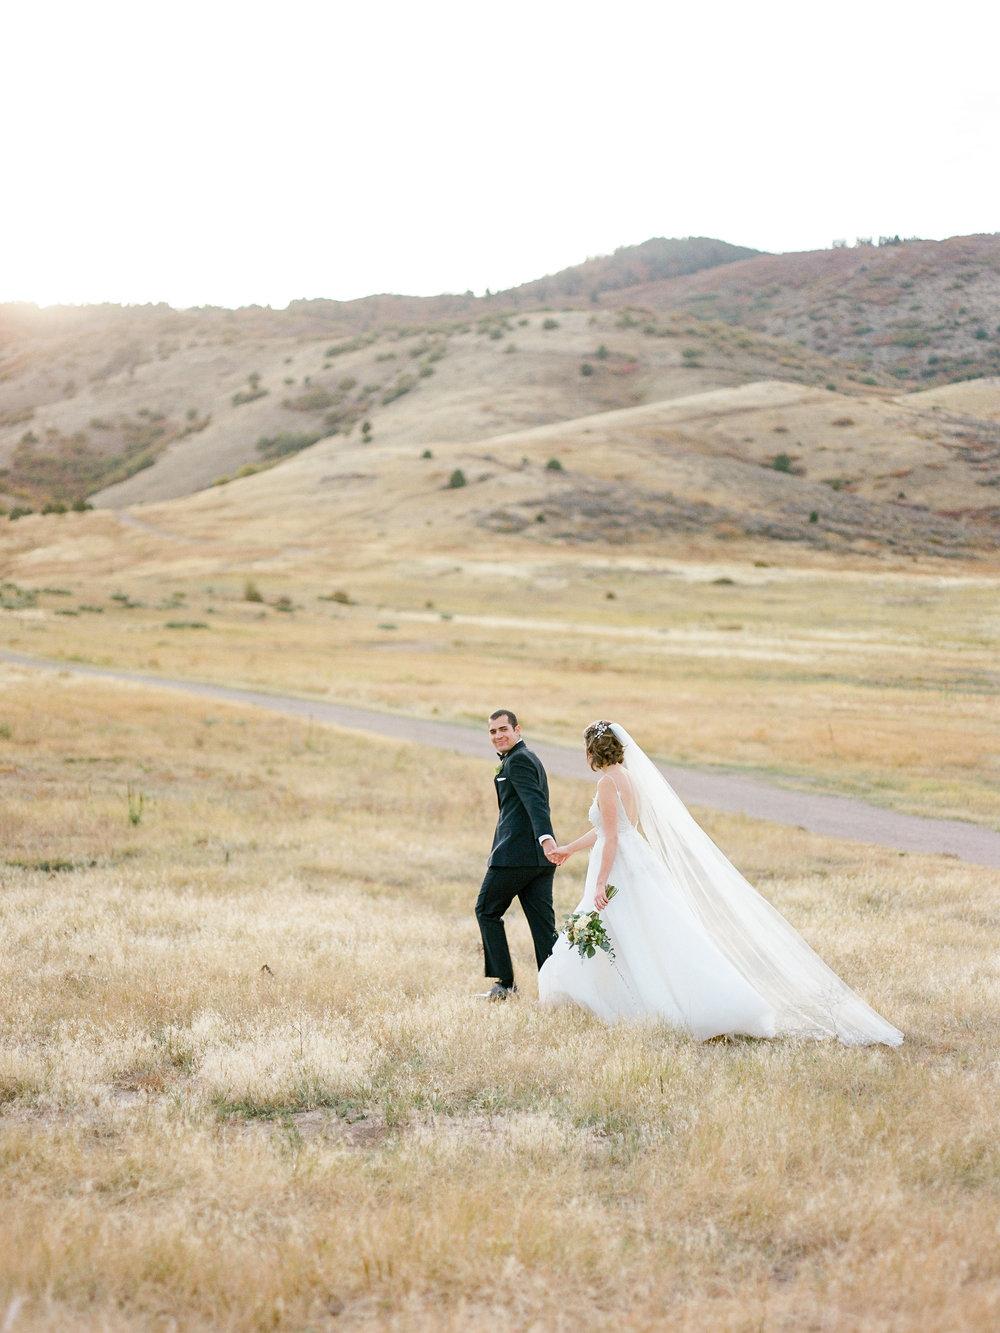 madeline-roberto-wedding-bride-groom-93.jpg